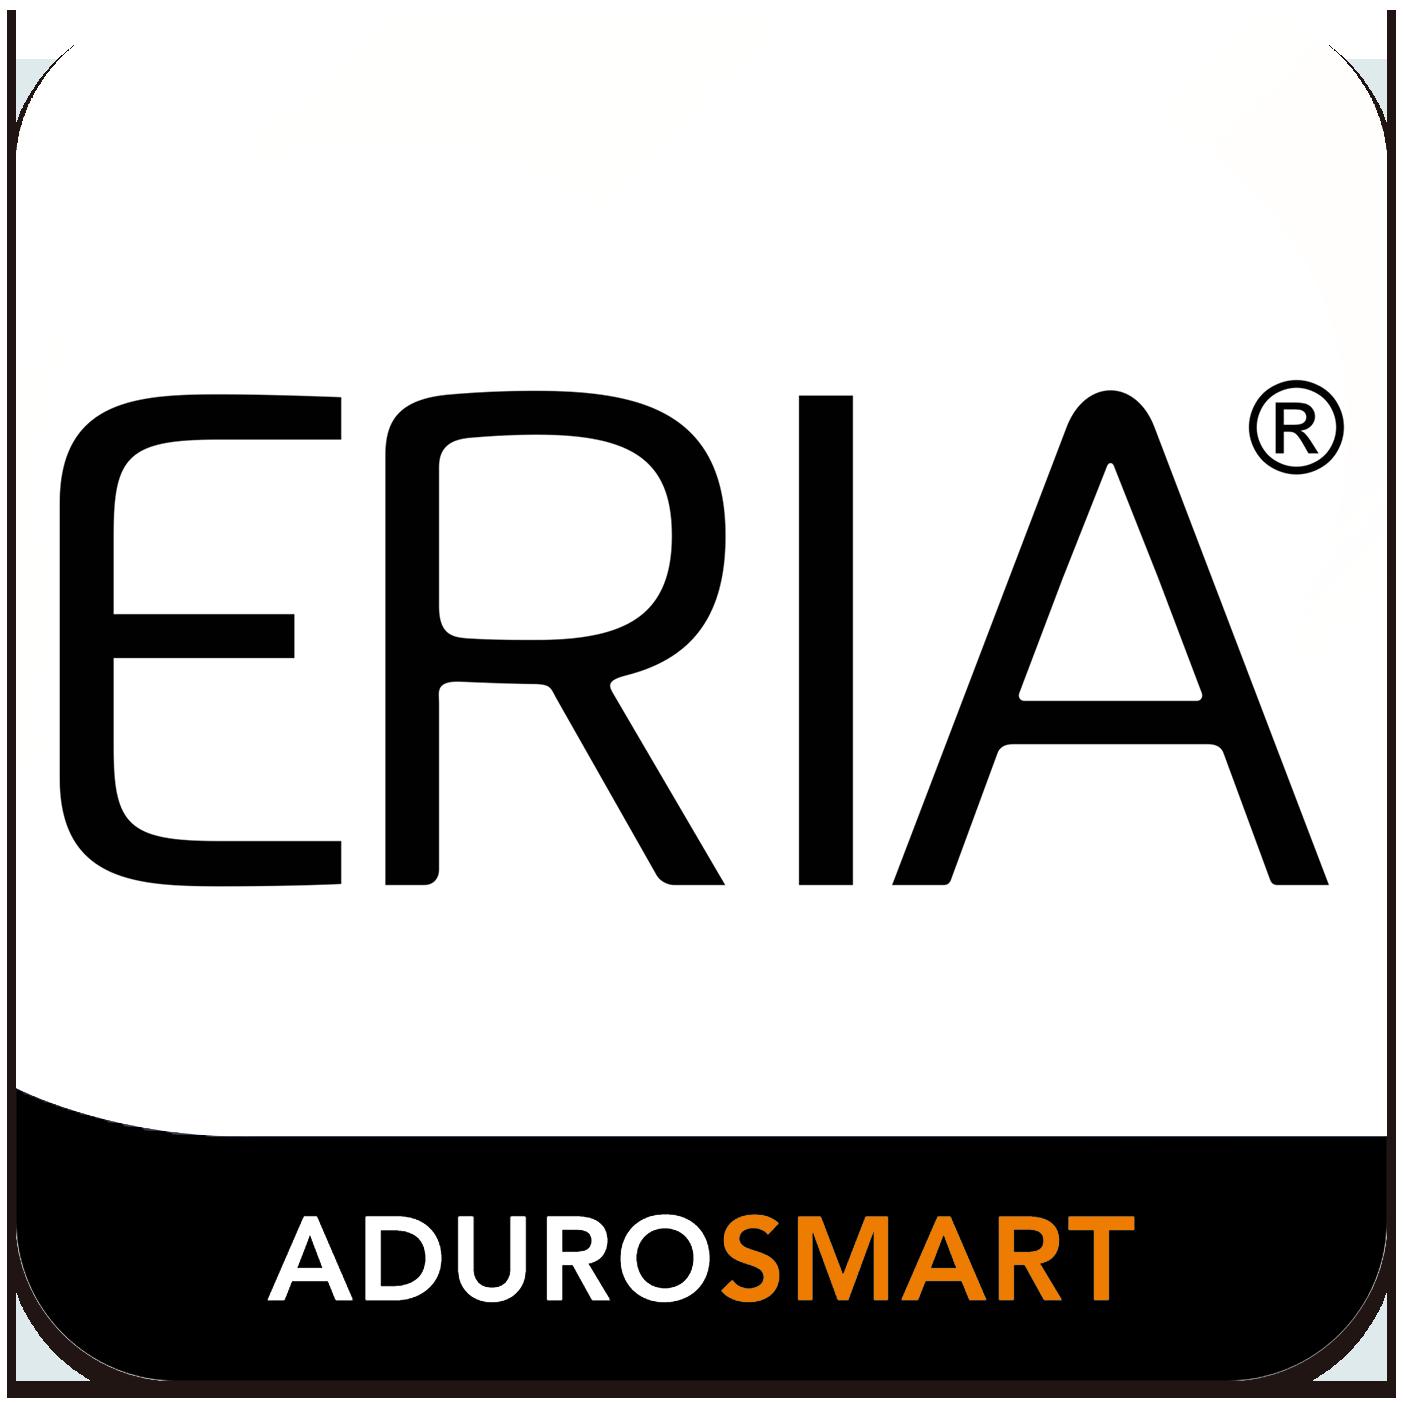 Support — AduroSmart ERIA